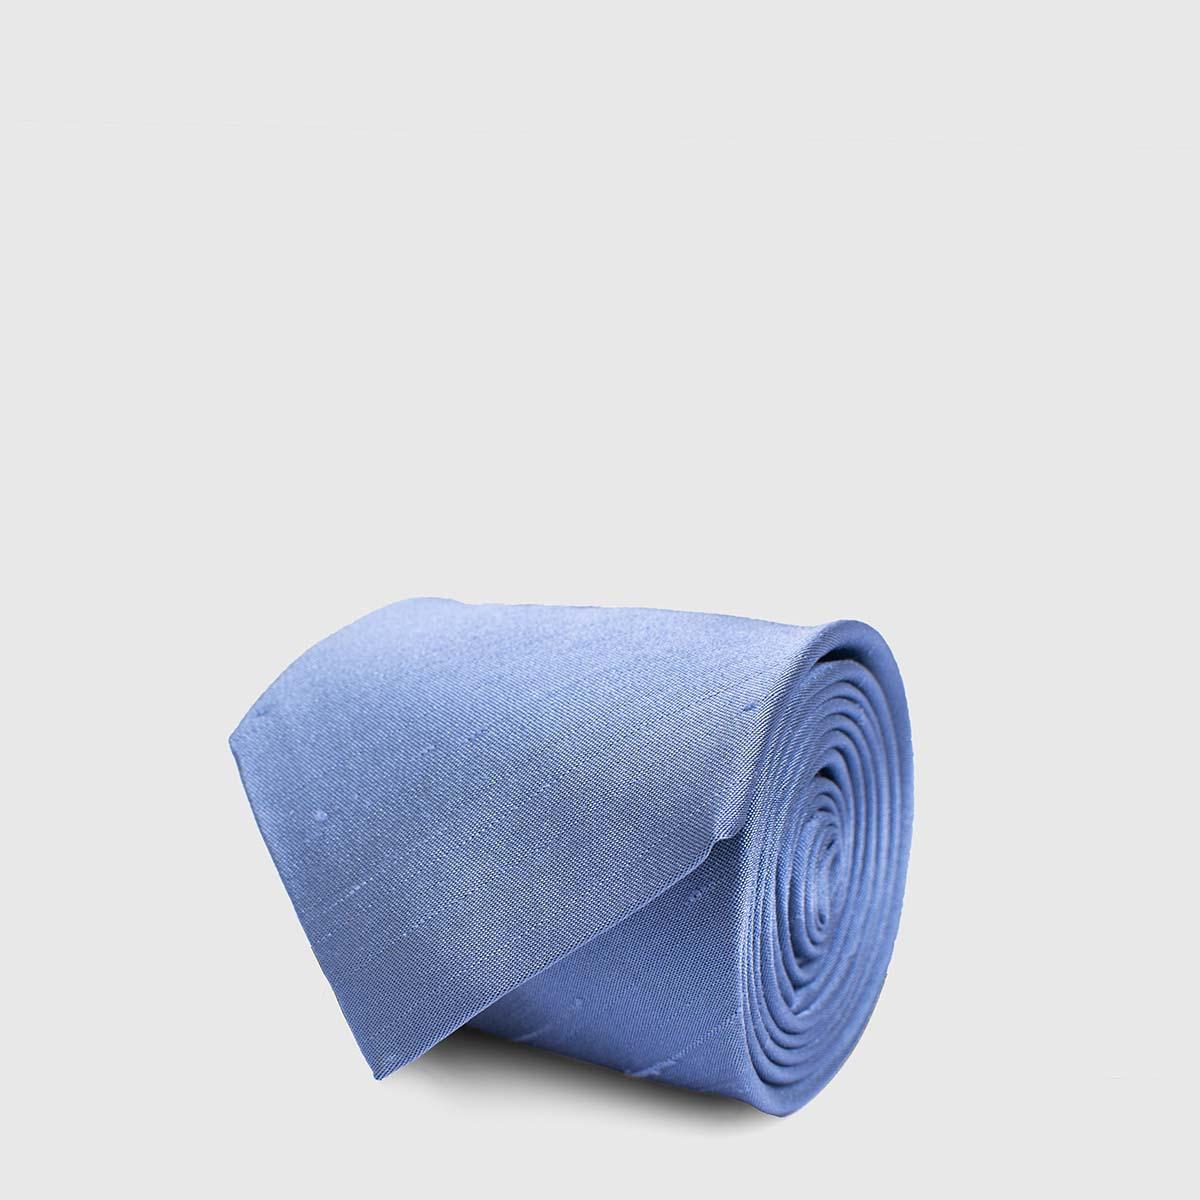 5-Fold Tie light blue